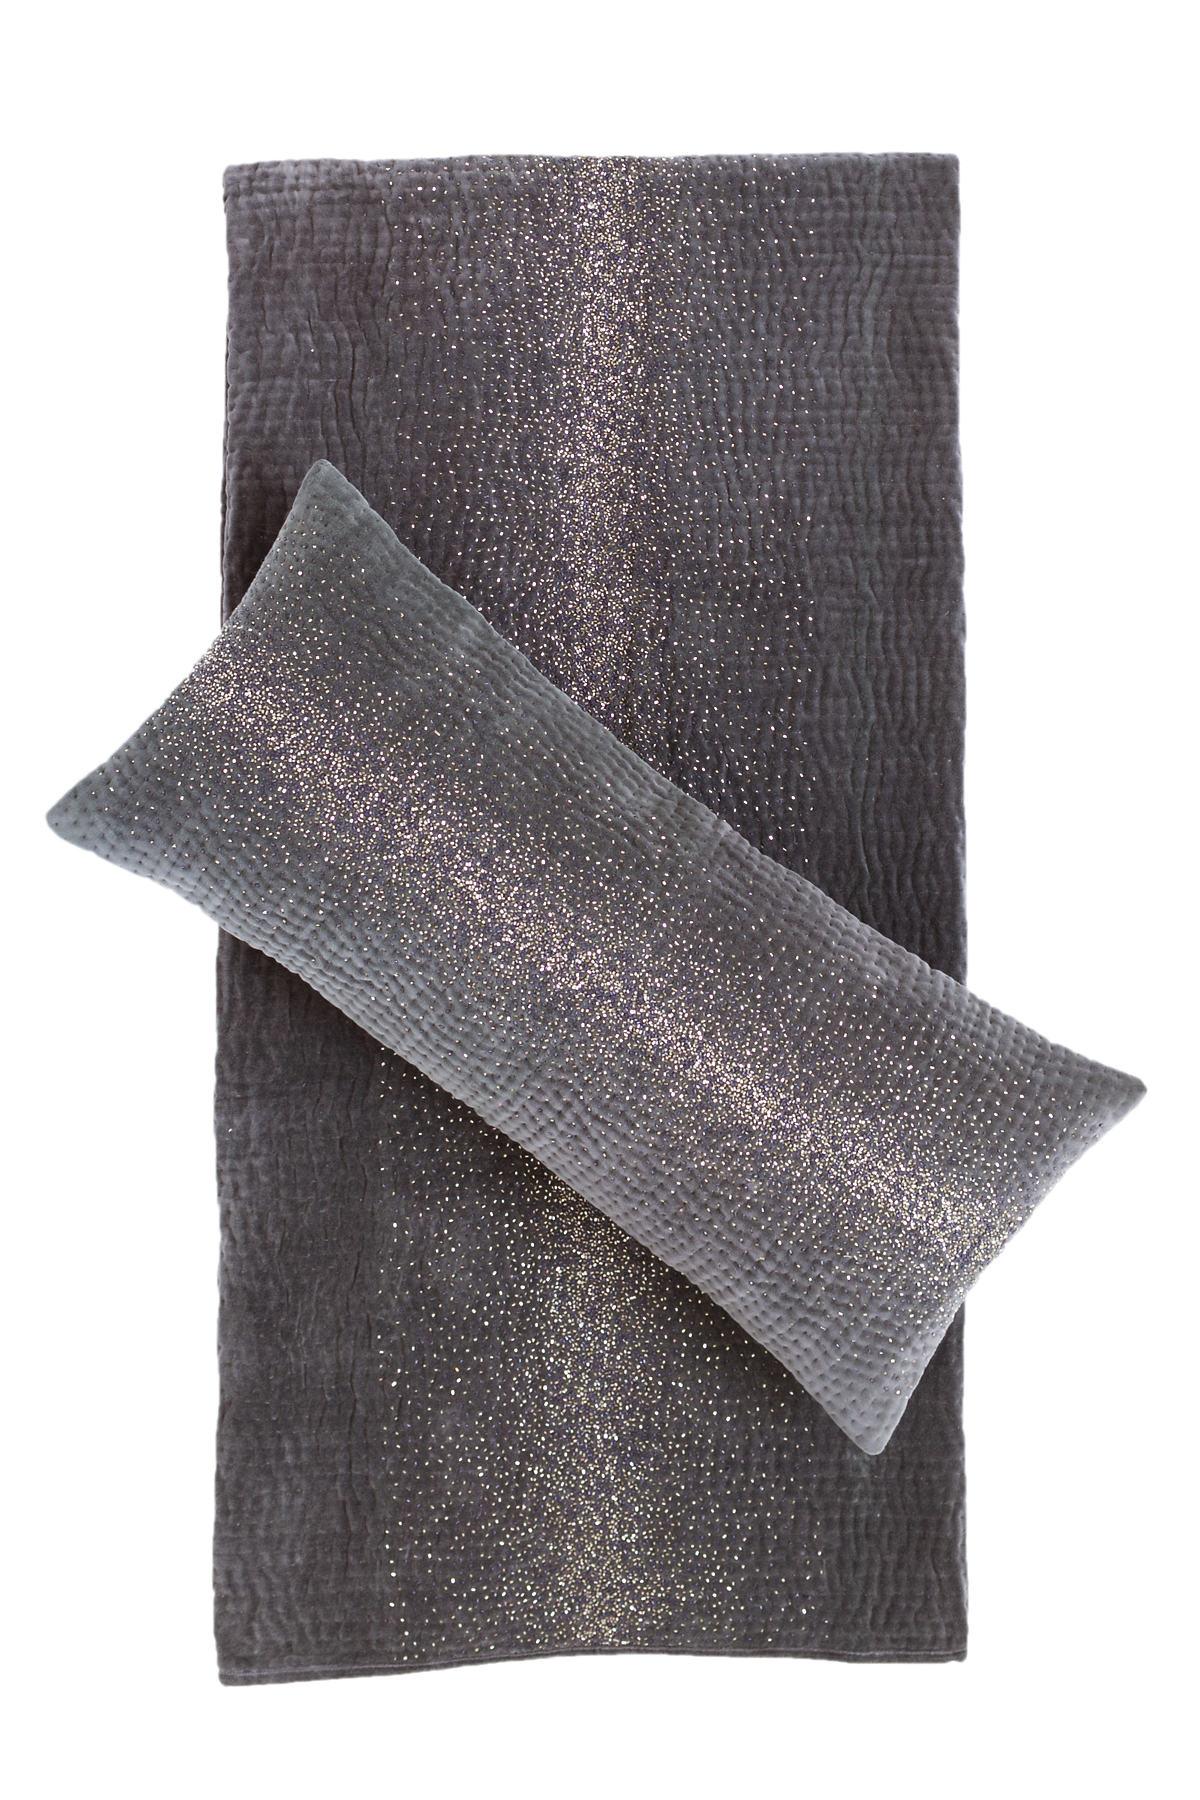 Stellata Quilted Velvet Decorative Pillow